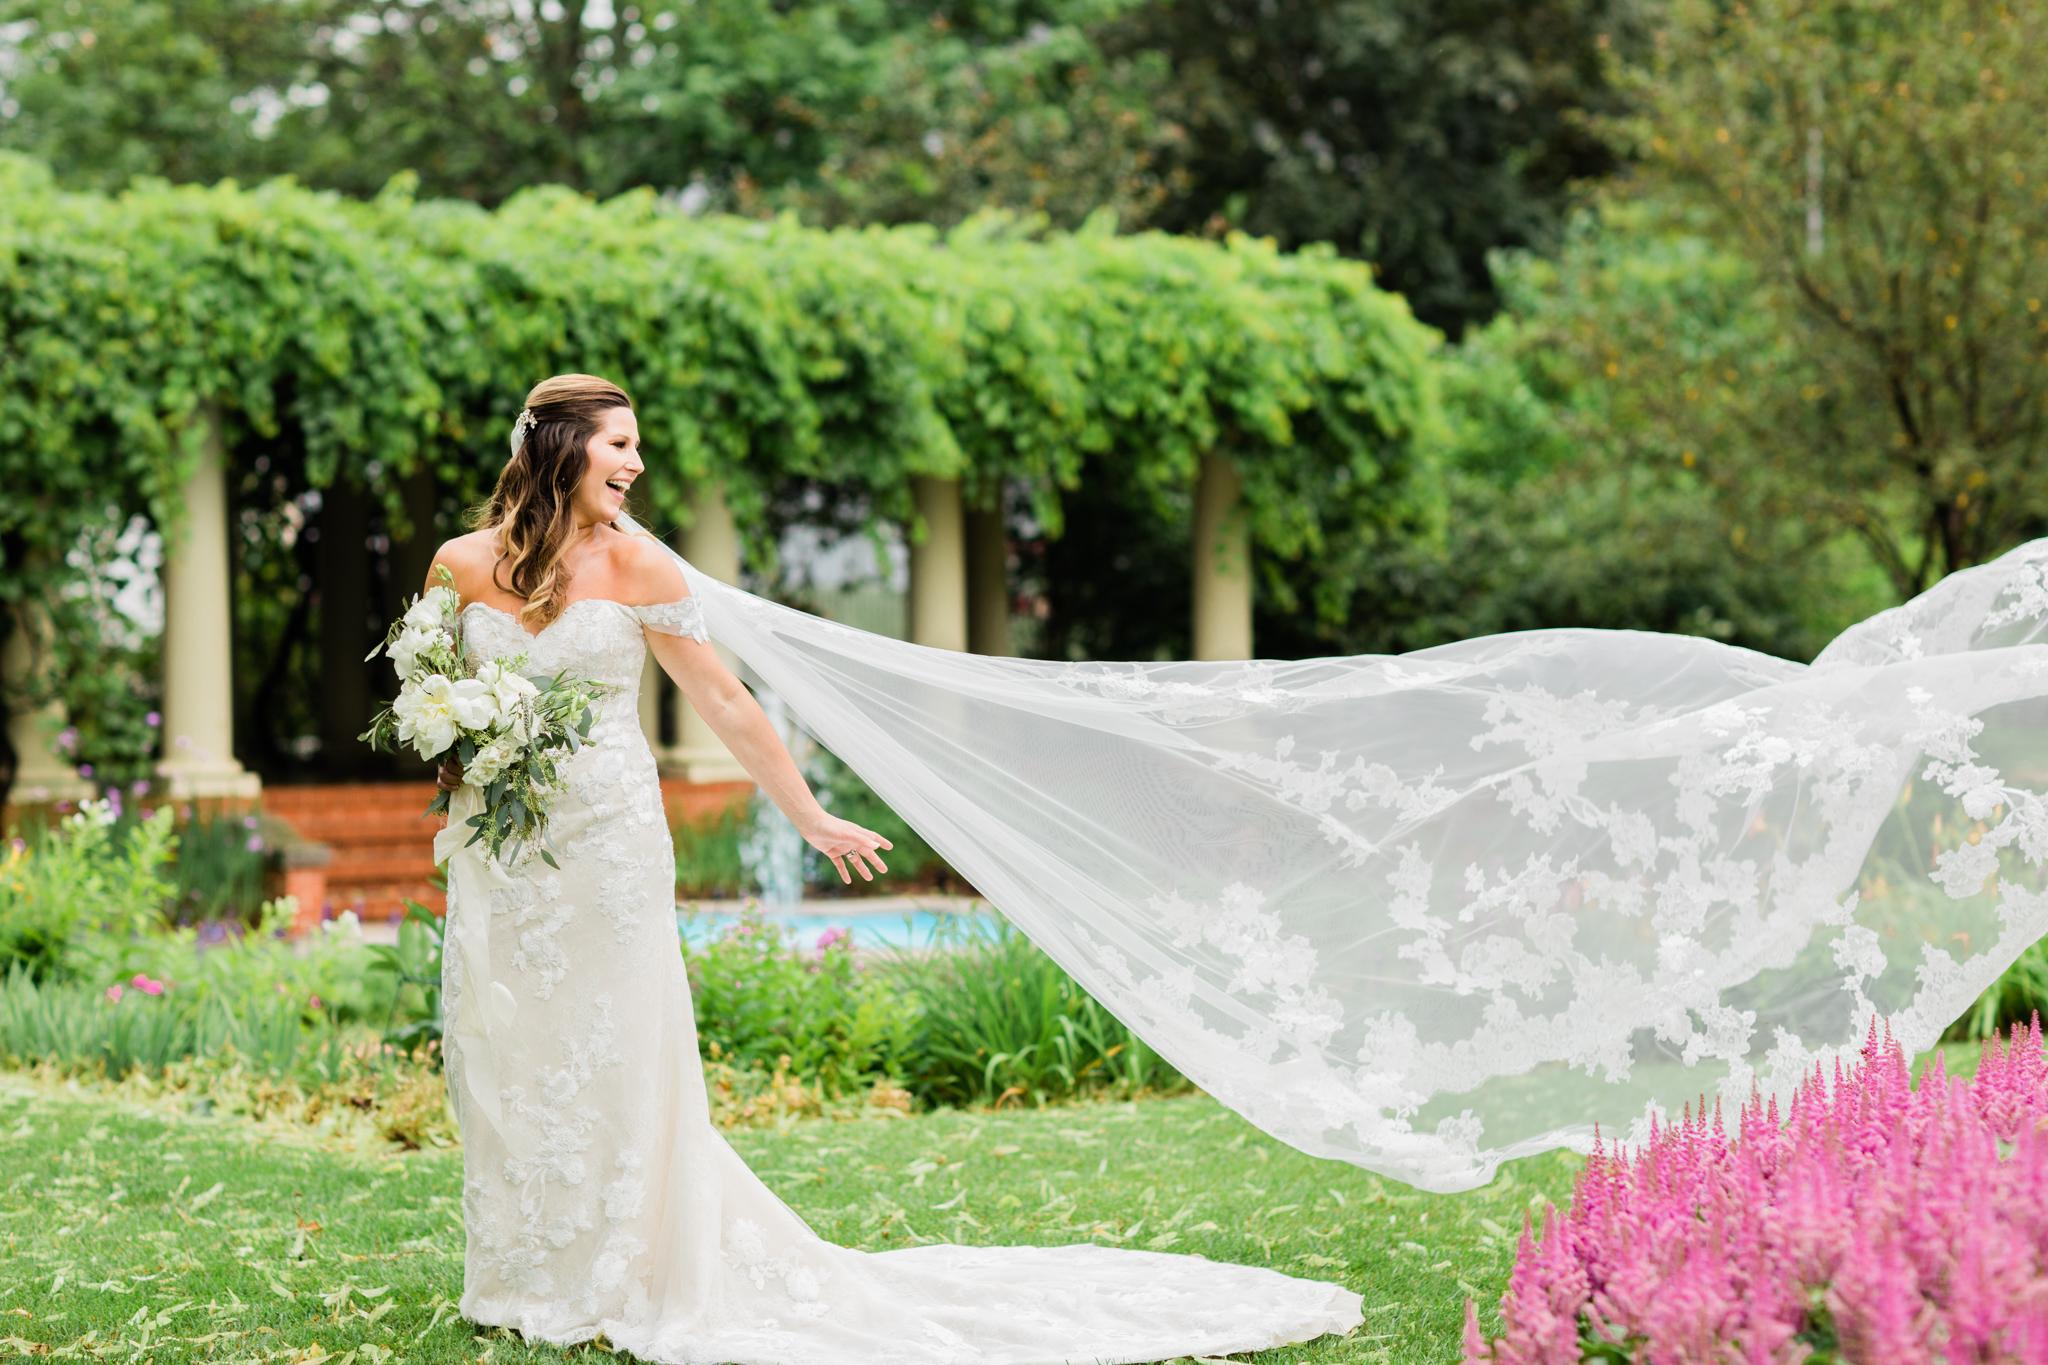 35-Katrina-Kyle-Jefferson-Inn-Wisconsin-Bride-James-Stokes-Photography.jpg